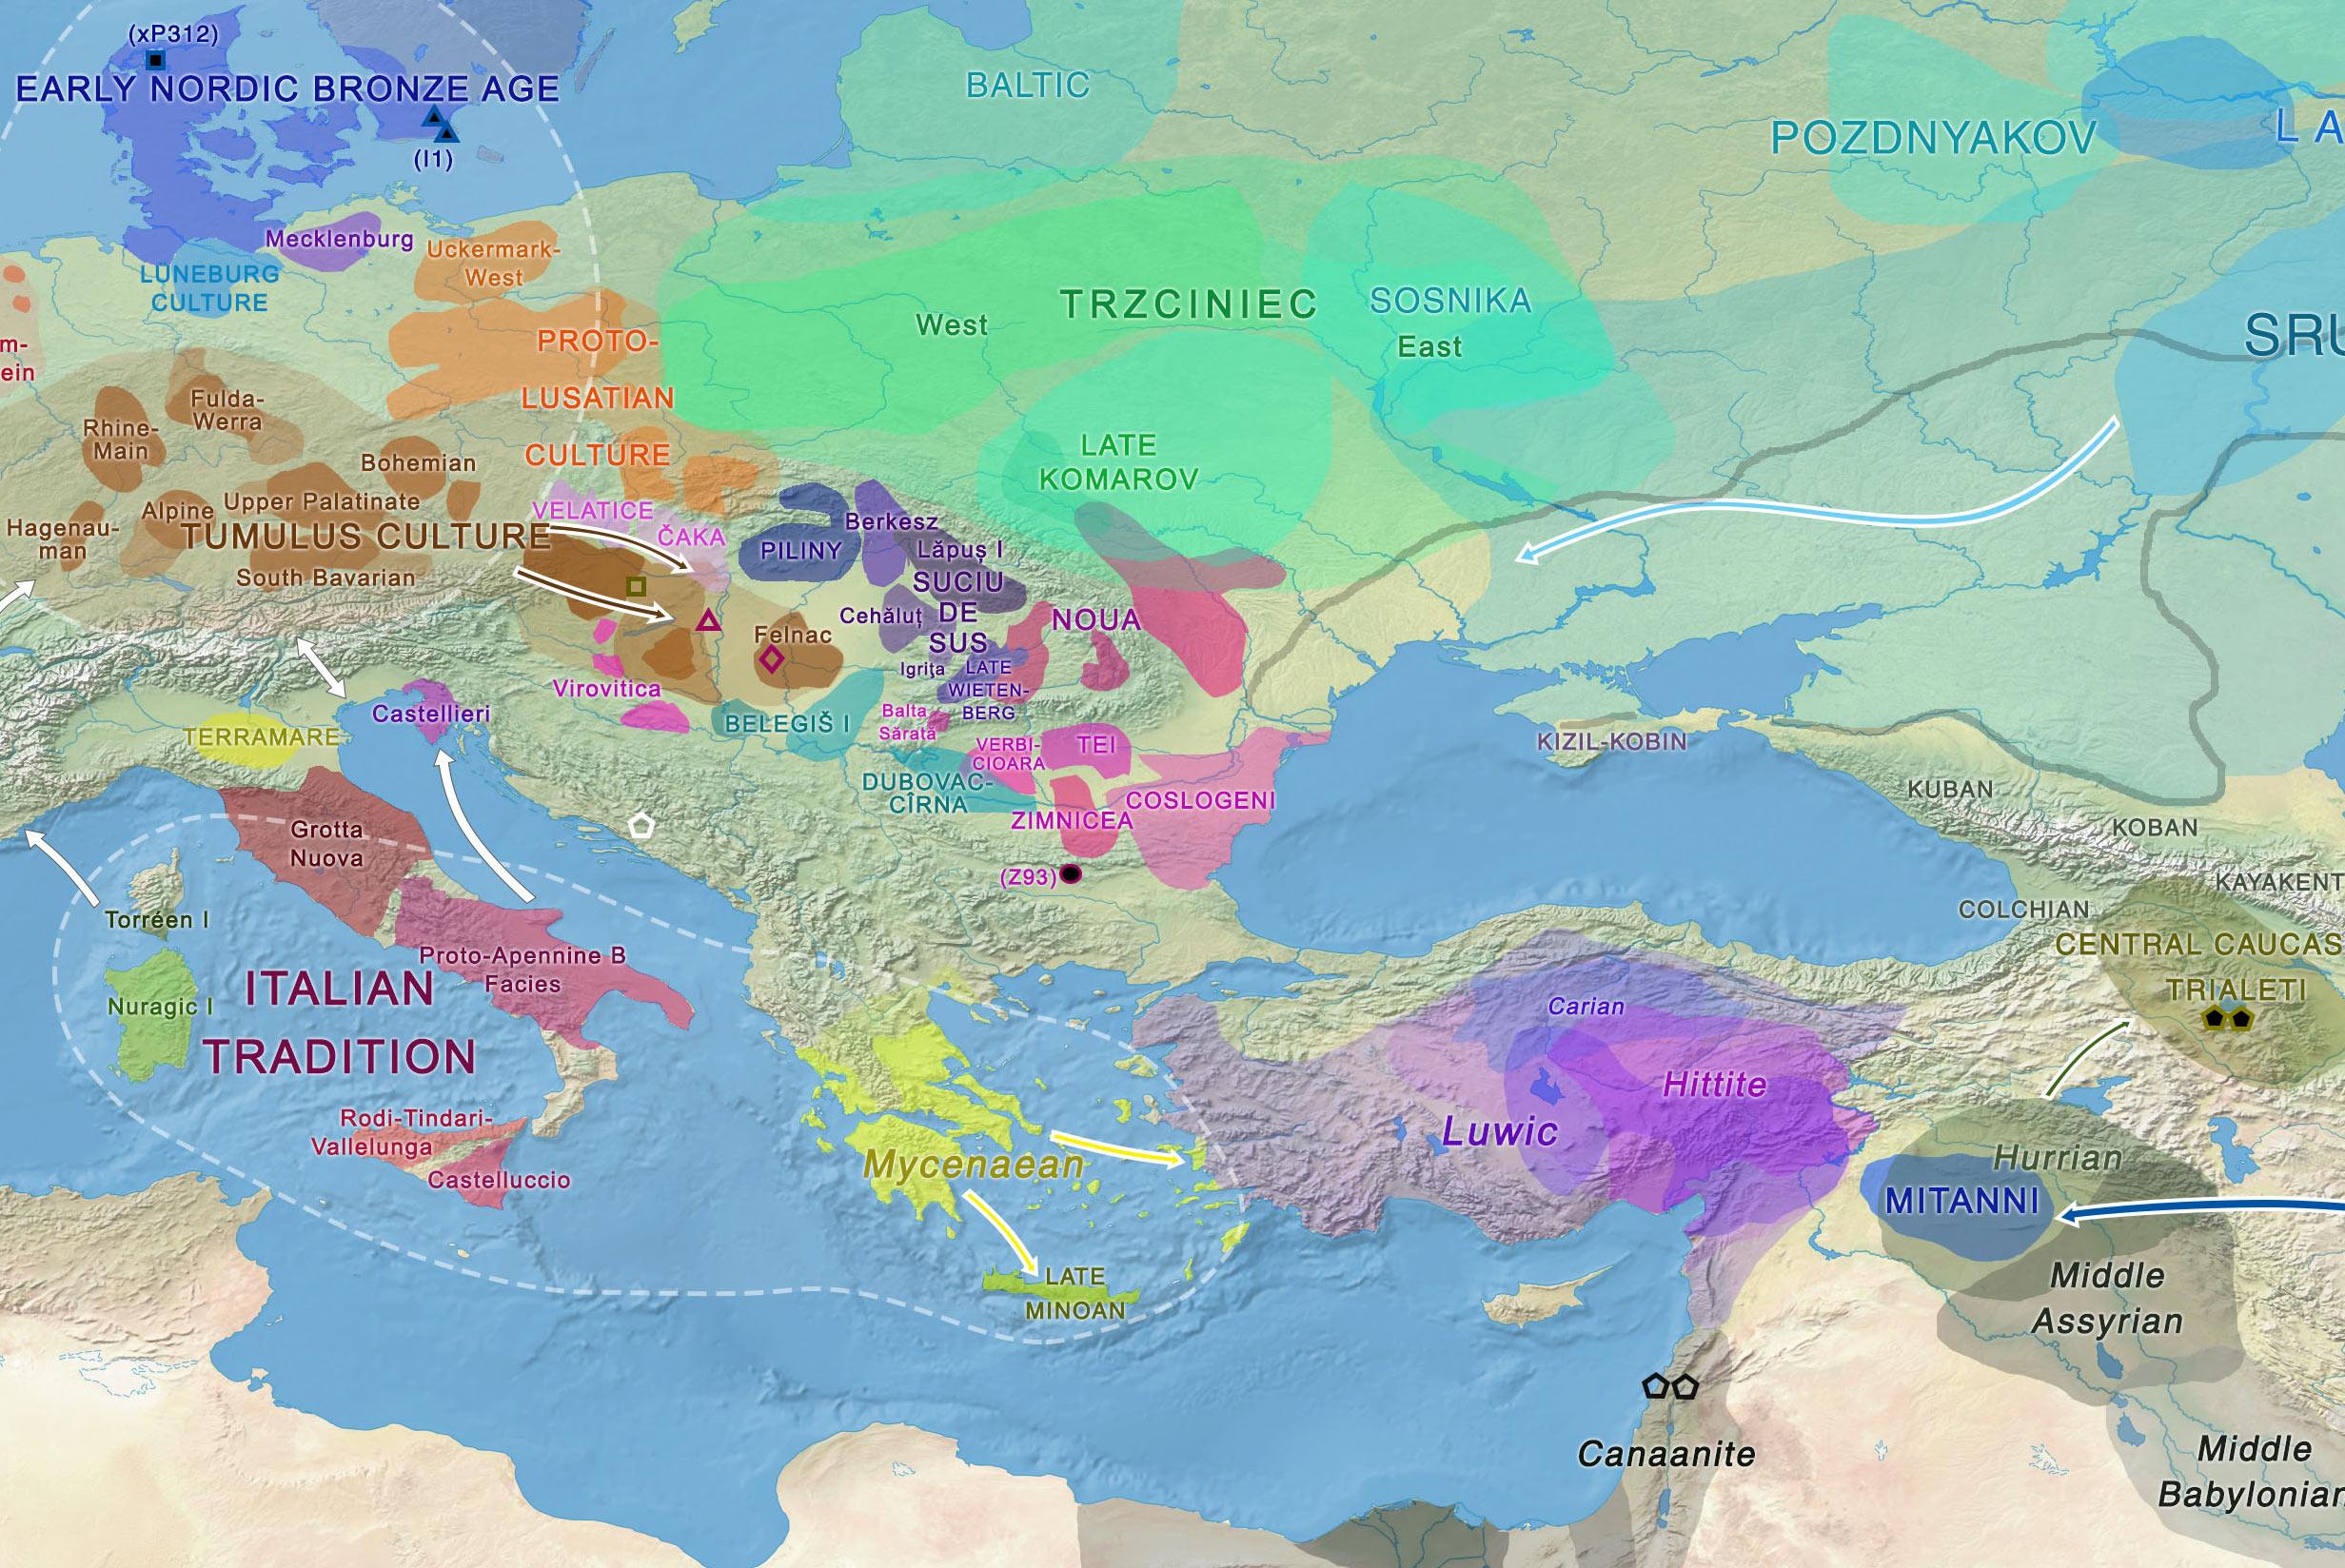 bronze-age-middle-greek.jpg